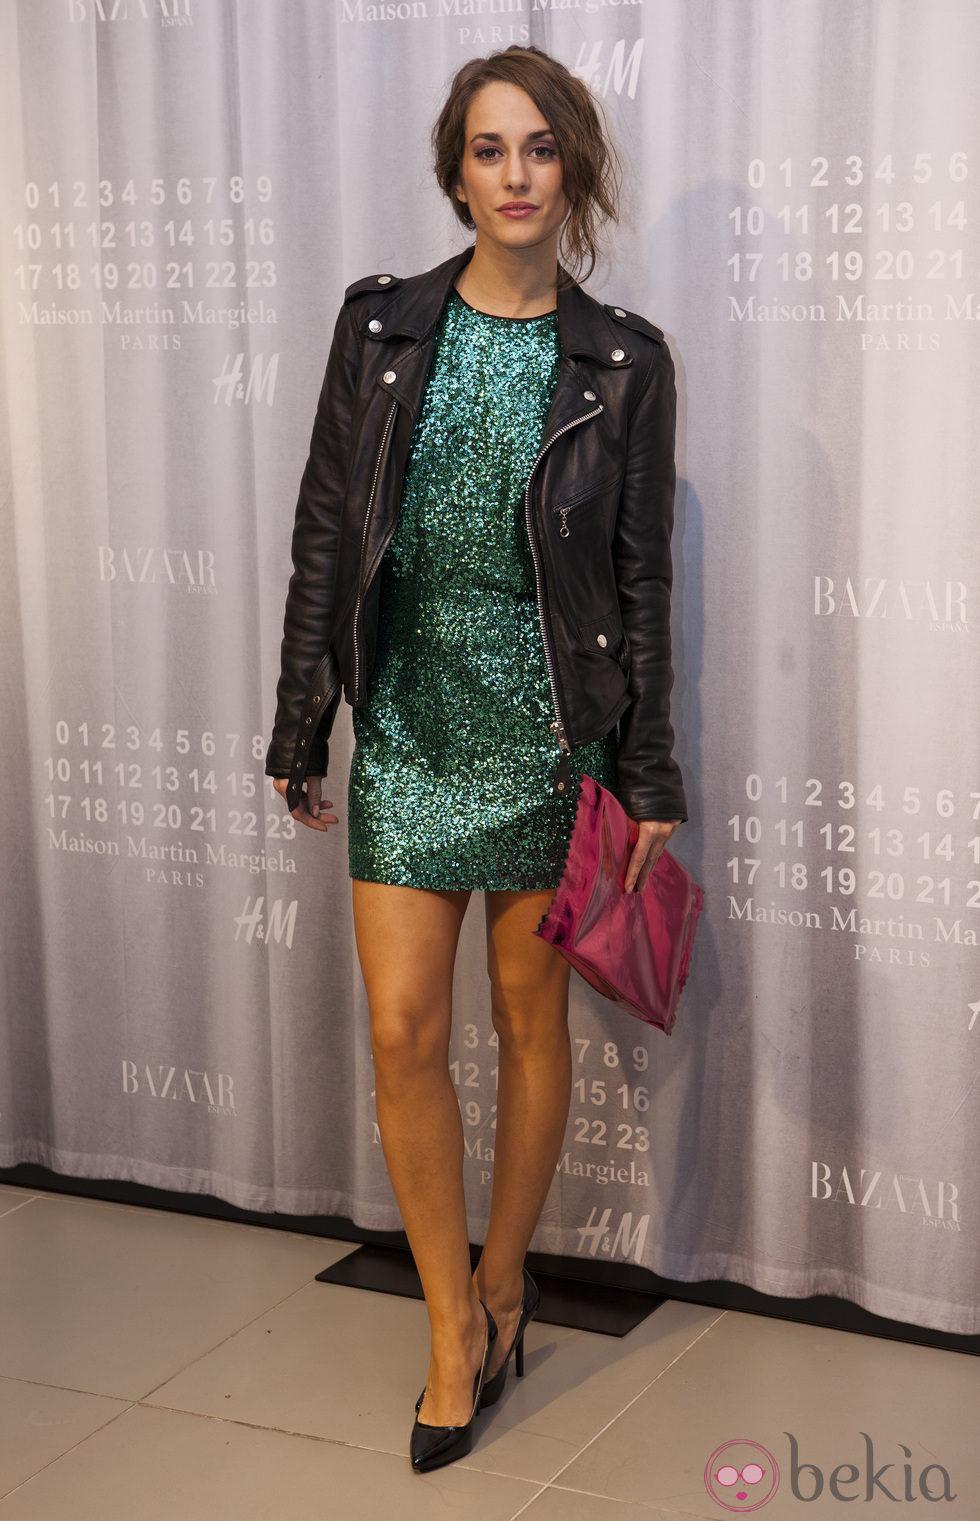 Silvia Alonso en la fiesta de Maison Martin Margiela y H&M